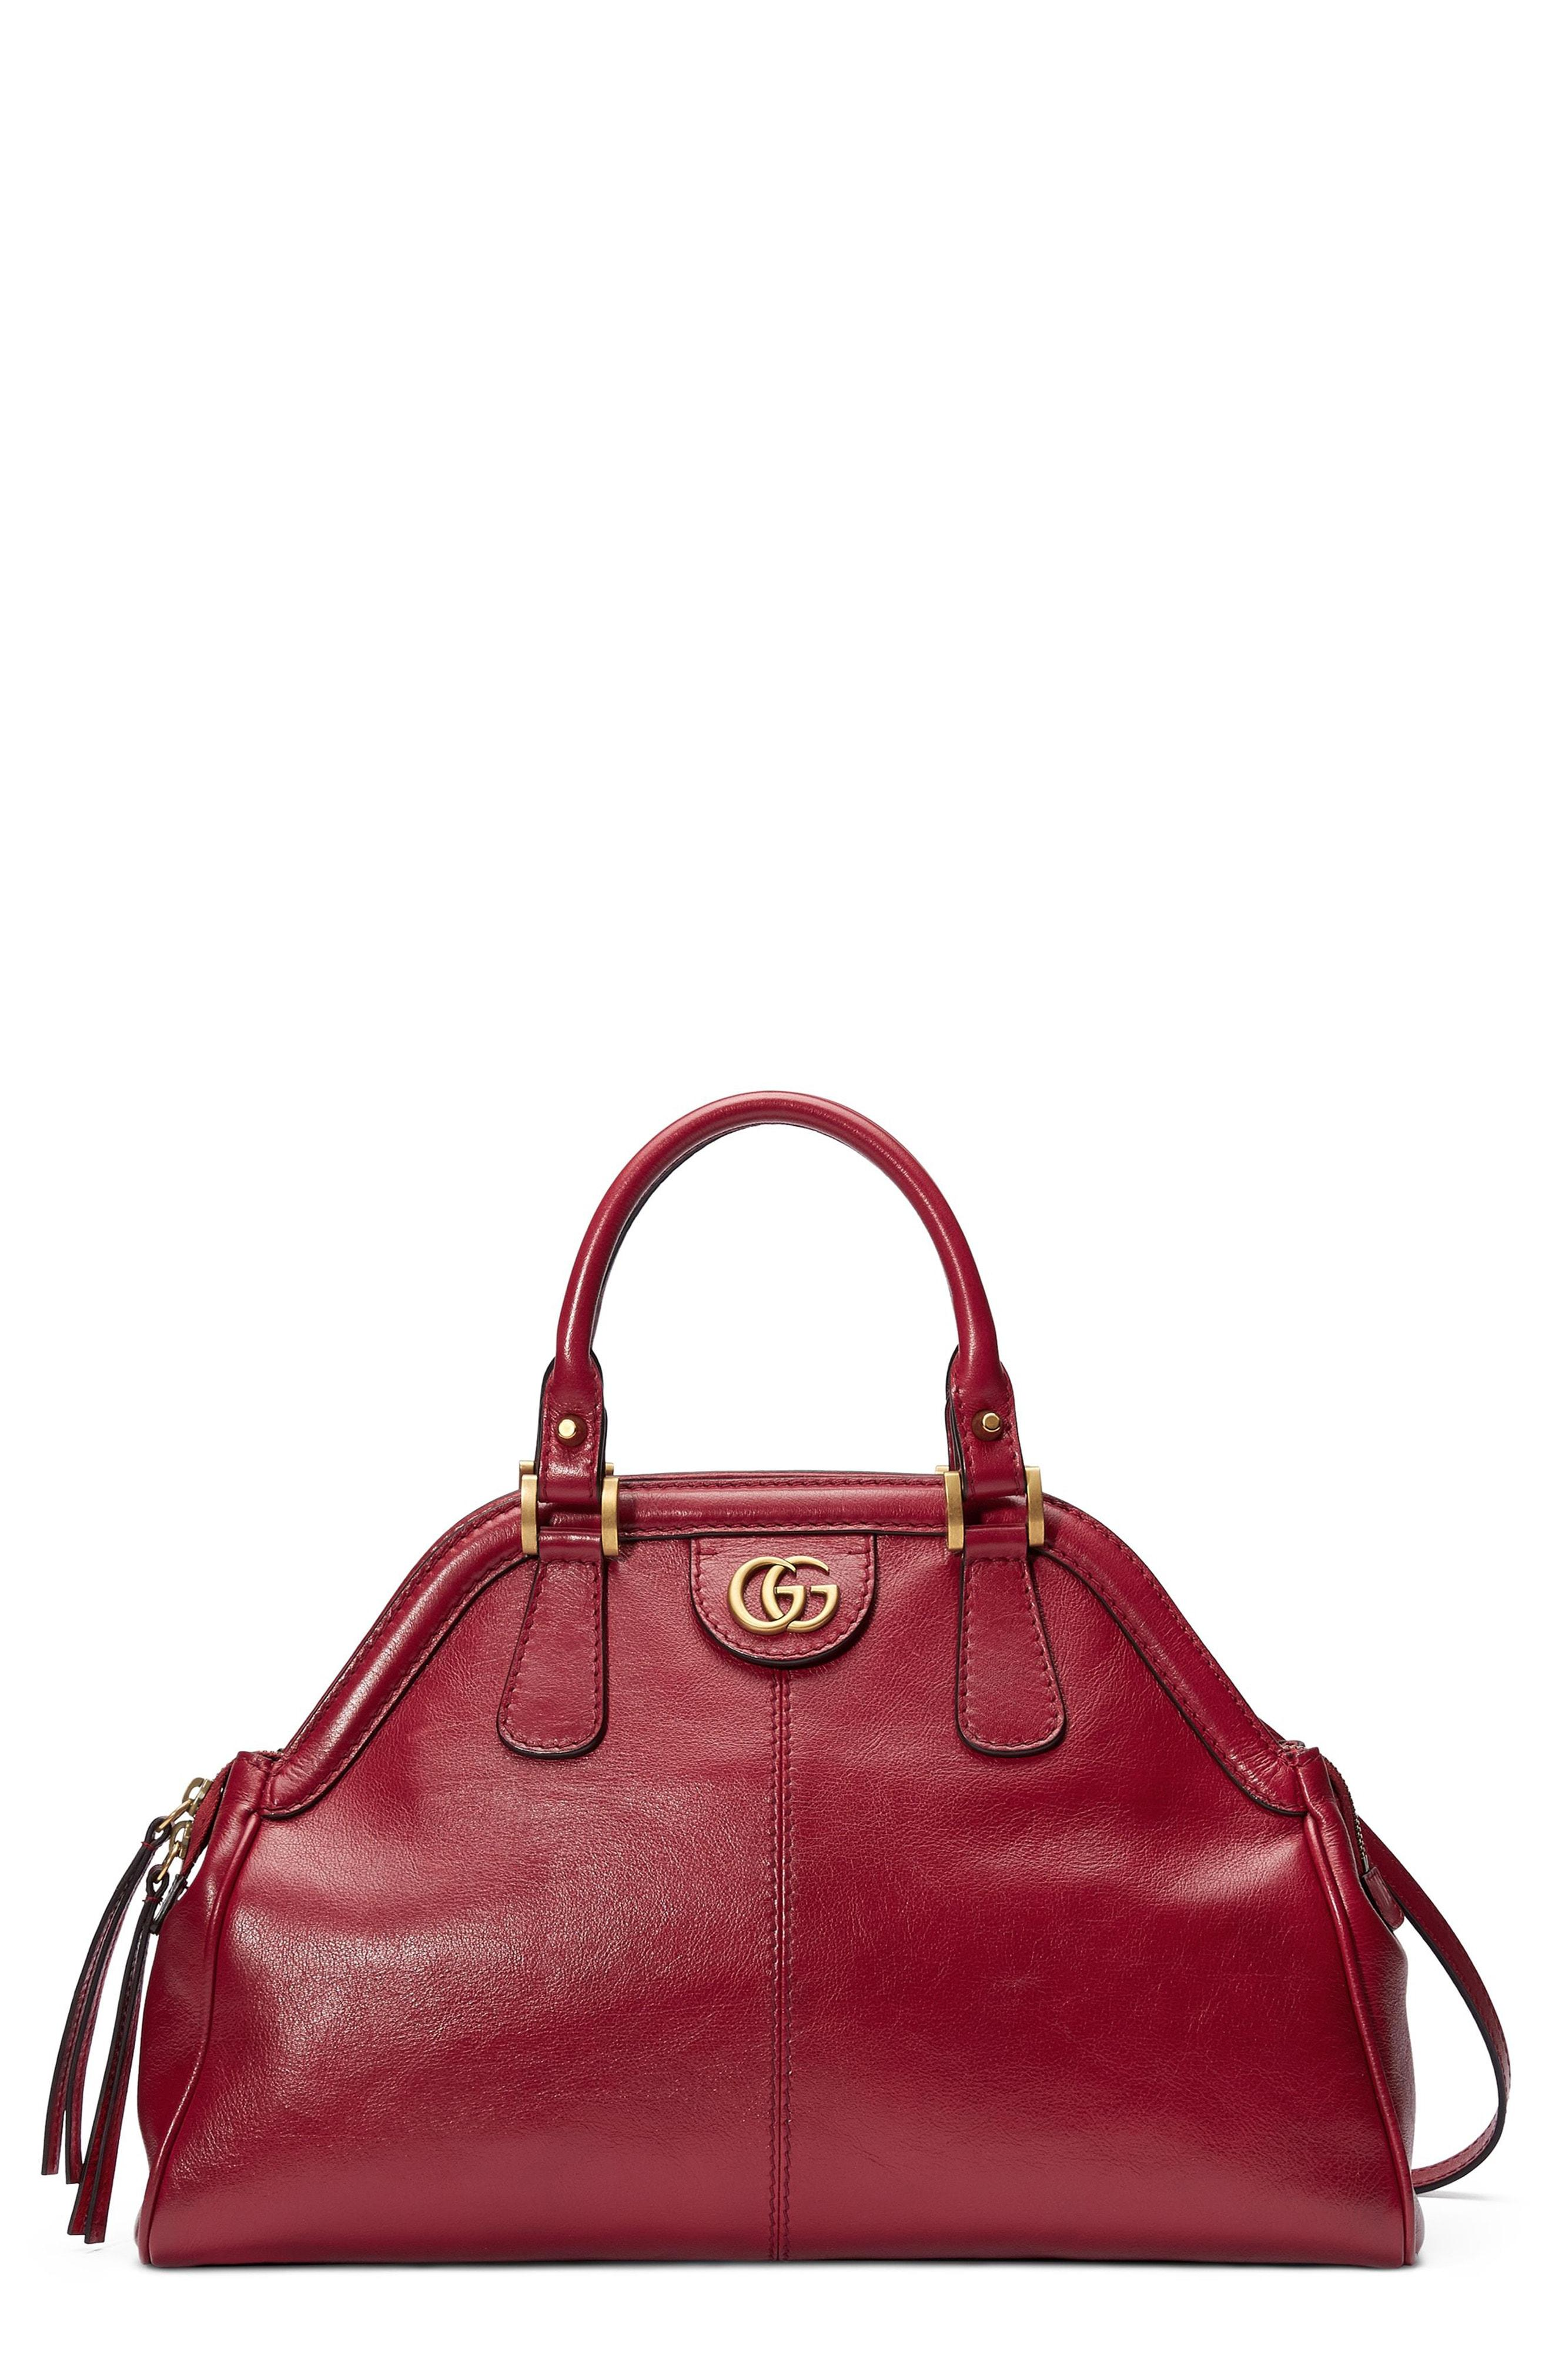 5f9768578a4ad Gucci Re(Belle) Medium Leather Cross-Body Bag In 6438 Cerise